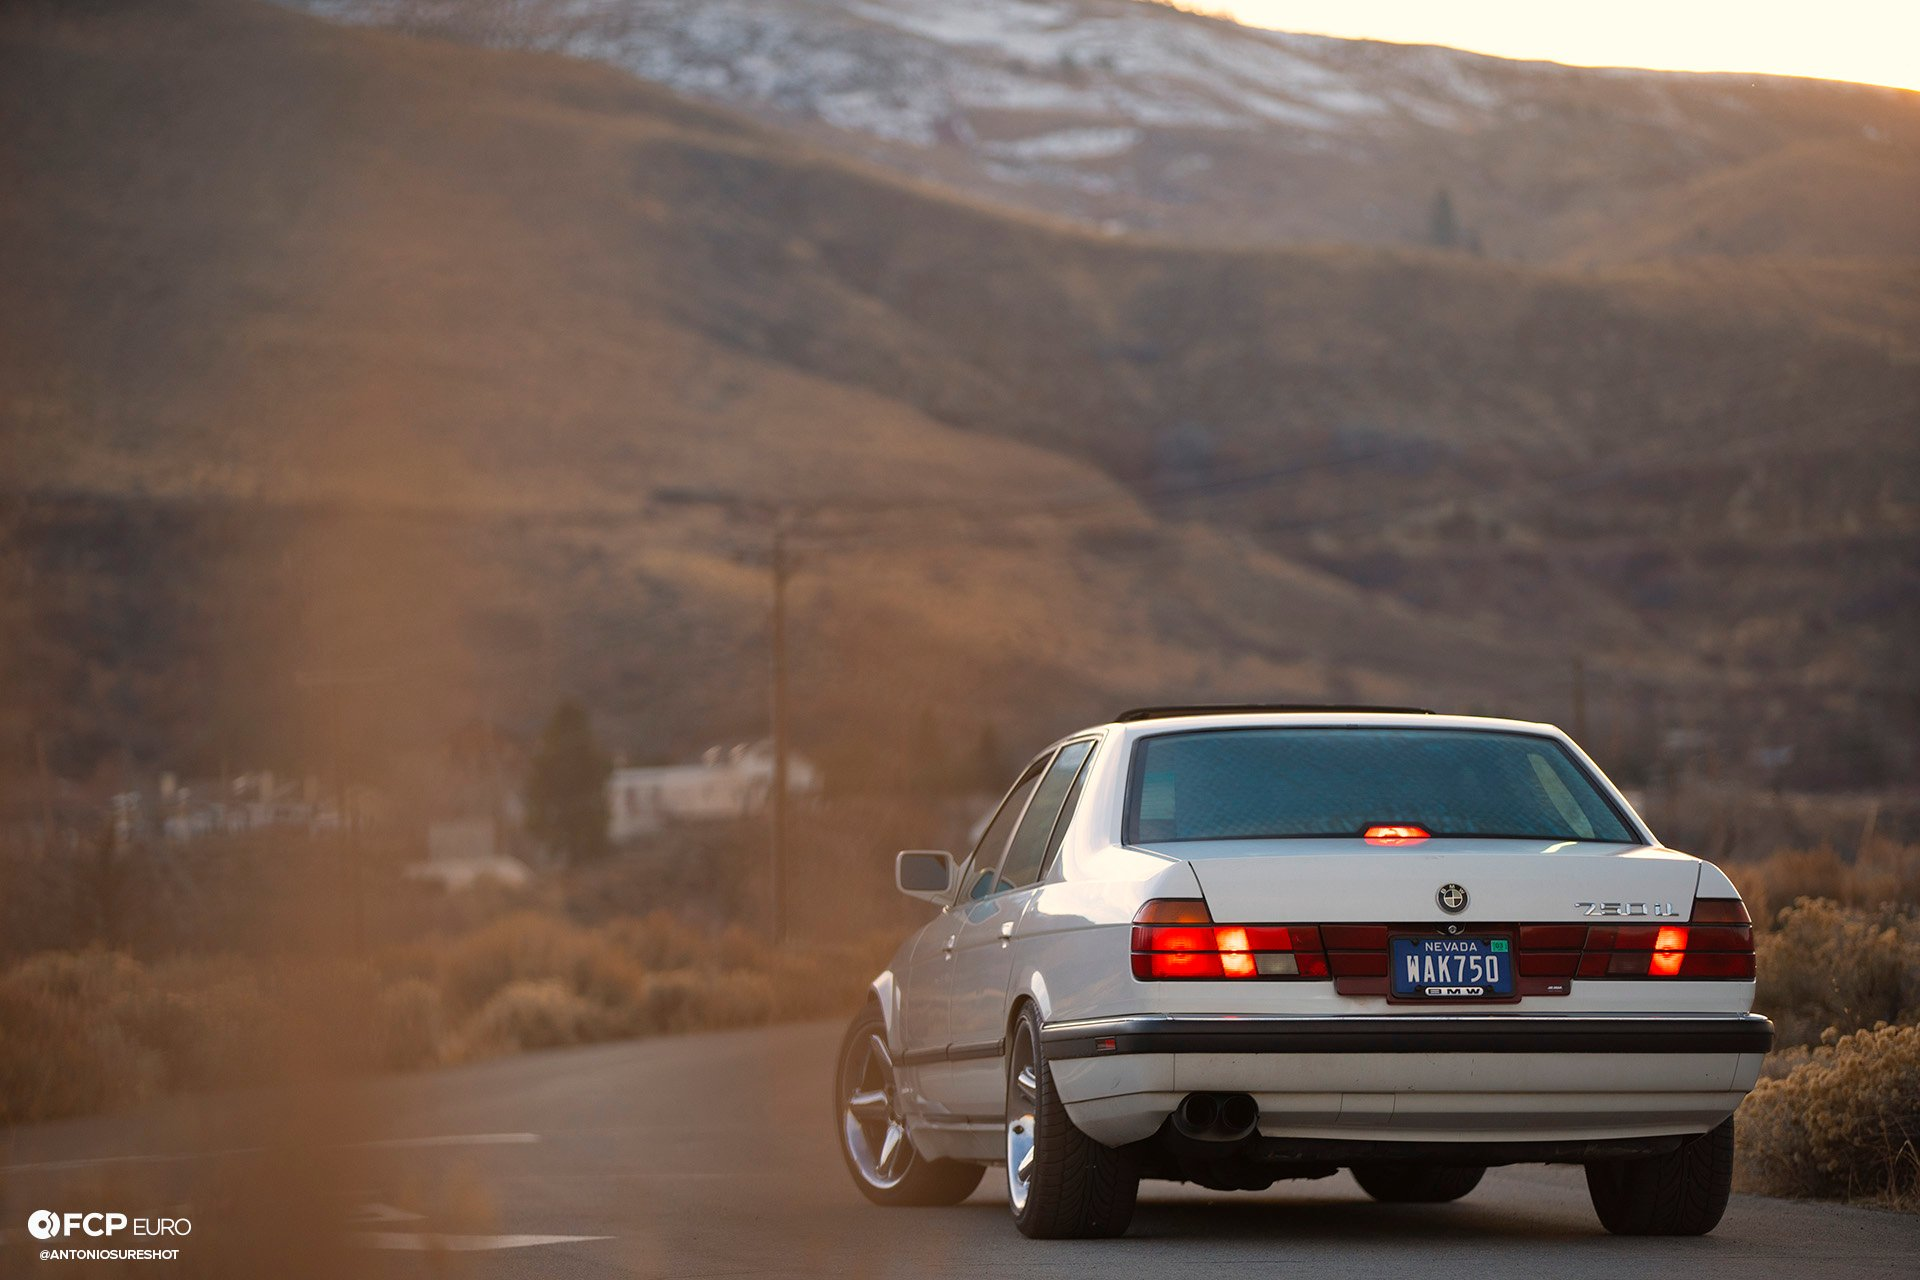 BMW E32 750iL 6 speed A9A02588